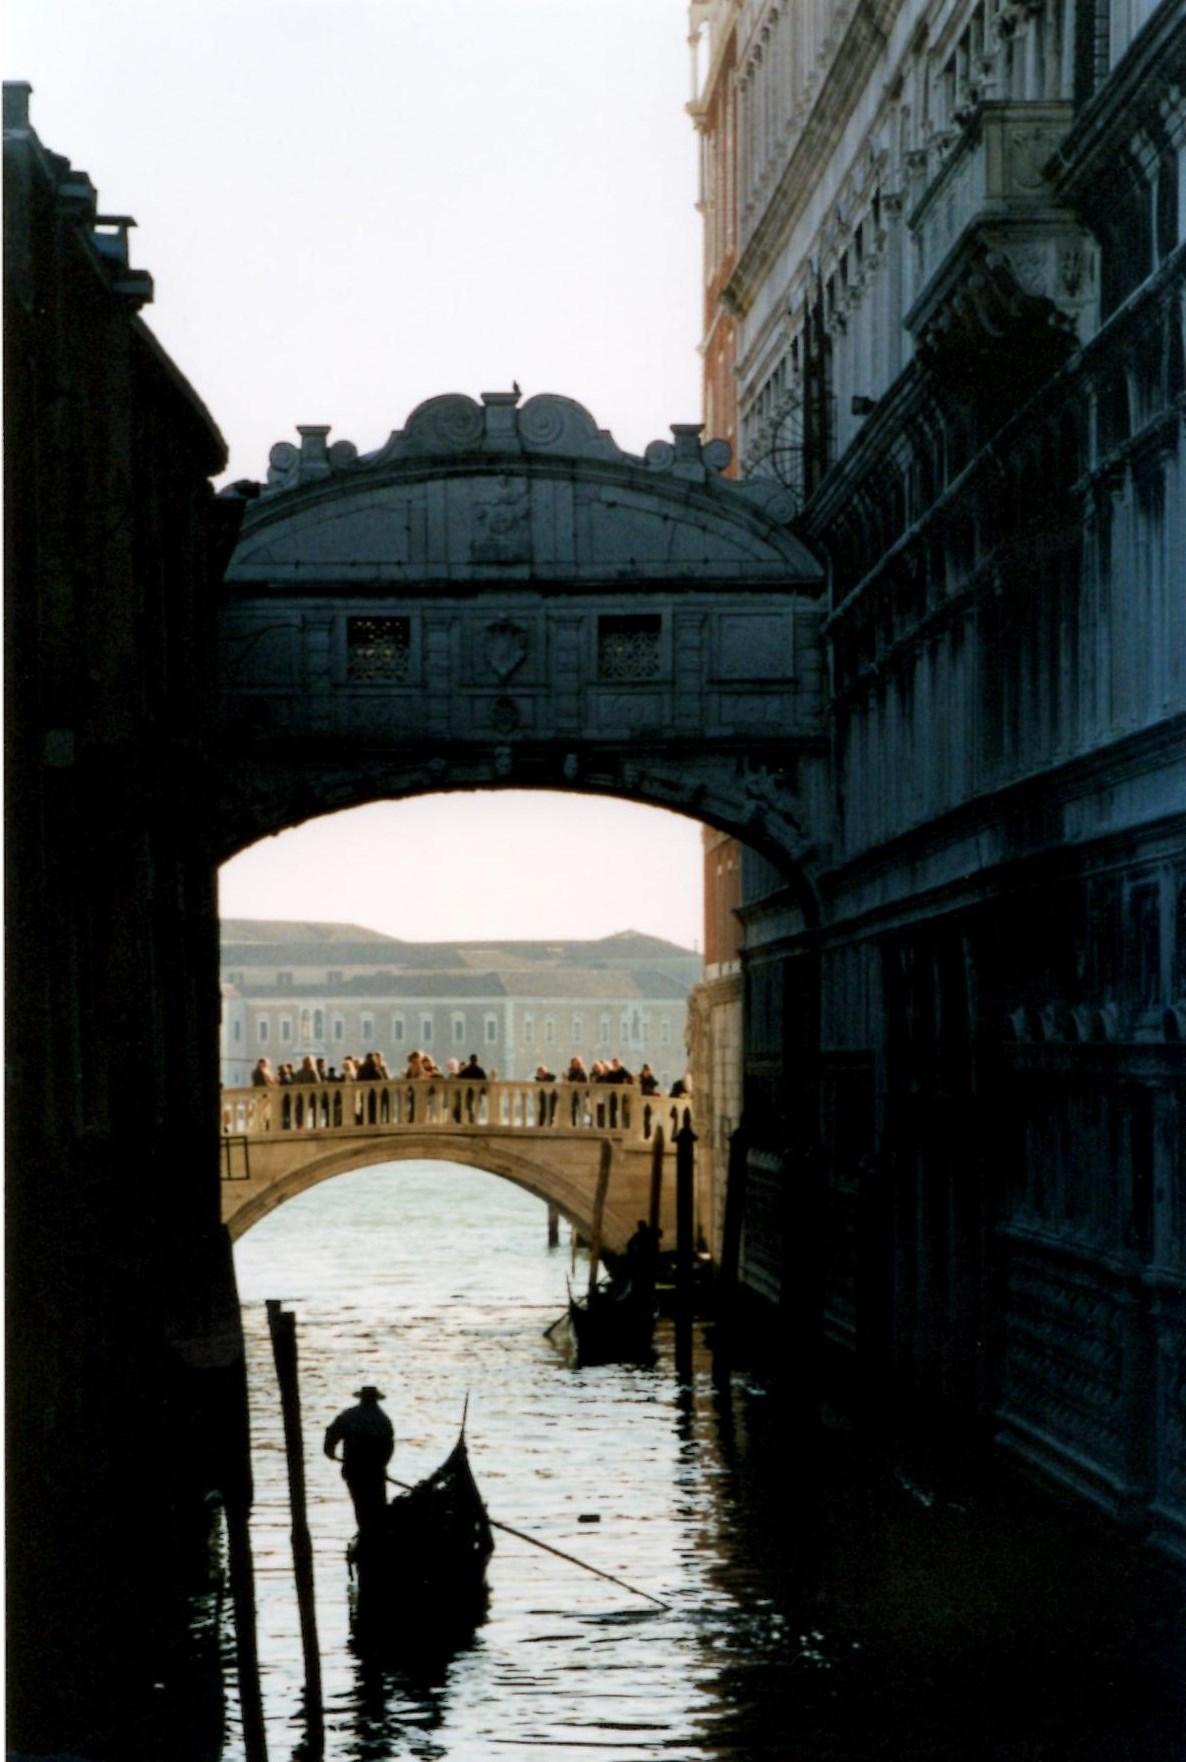 Explore the Disney Cruise Line port of Venice, Italy |PassPorter.com